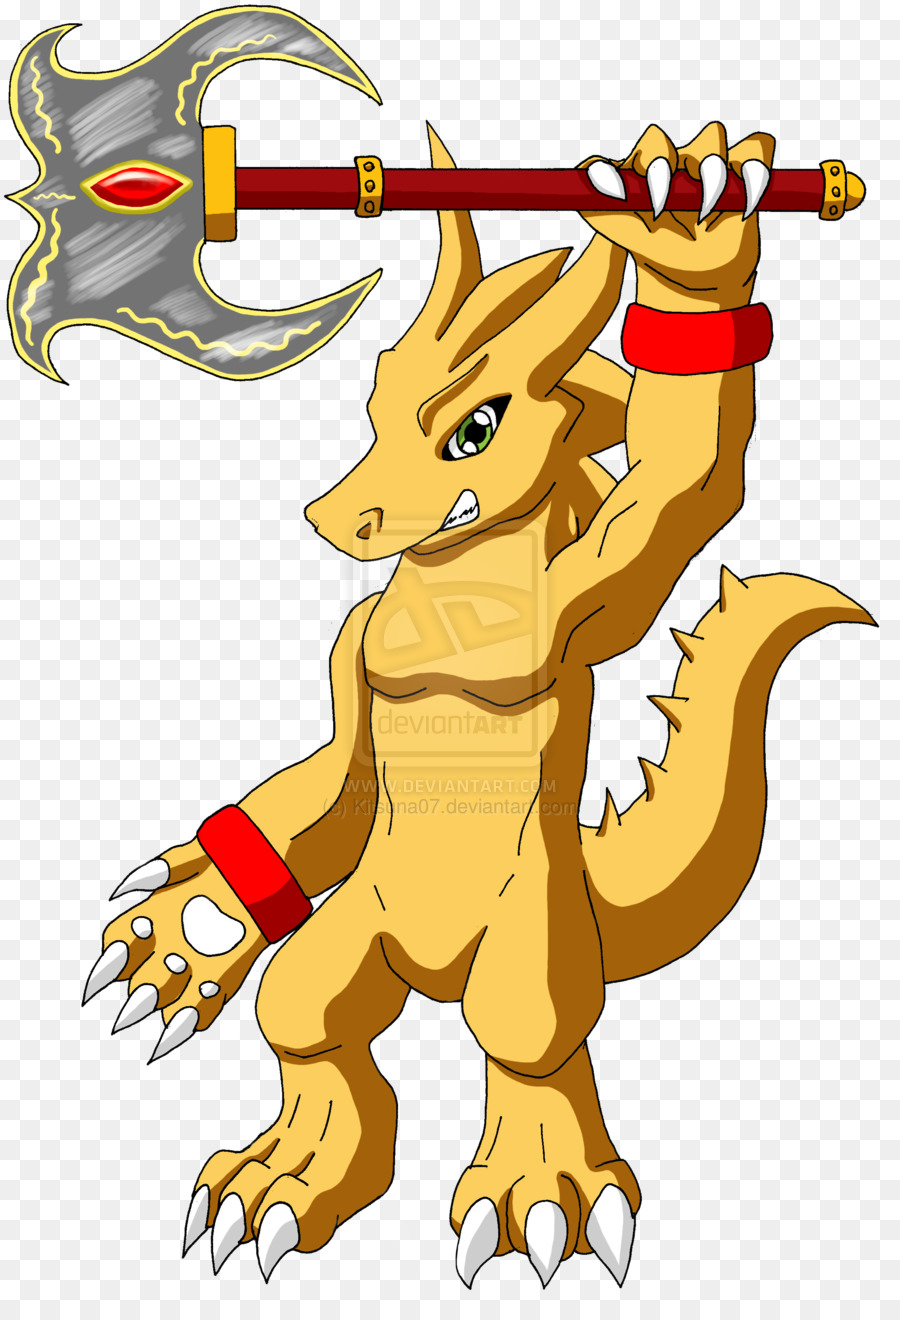 Monster Cartoon Png Download 900 1316 Free Transparent Digimon Story Lost Evolution Png Download Cleanpng Kisspng